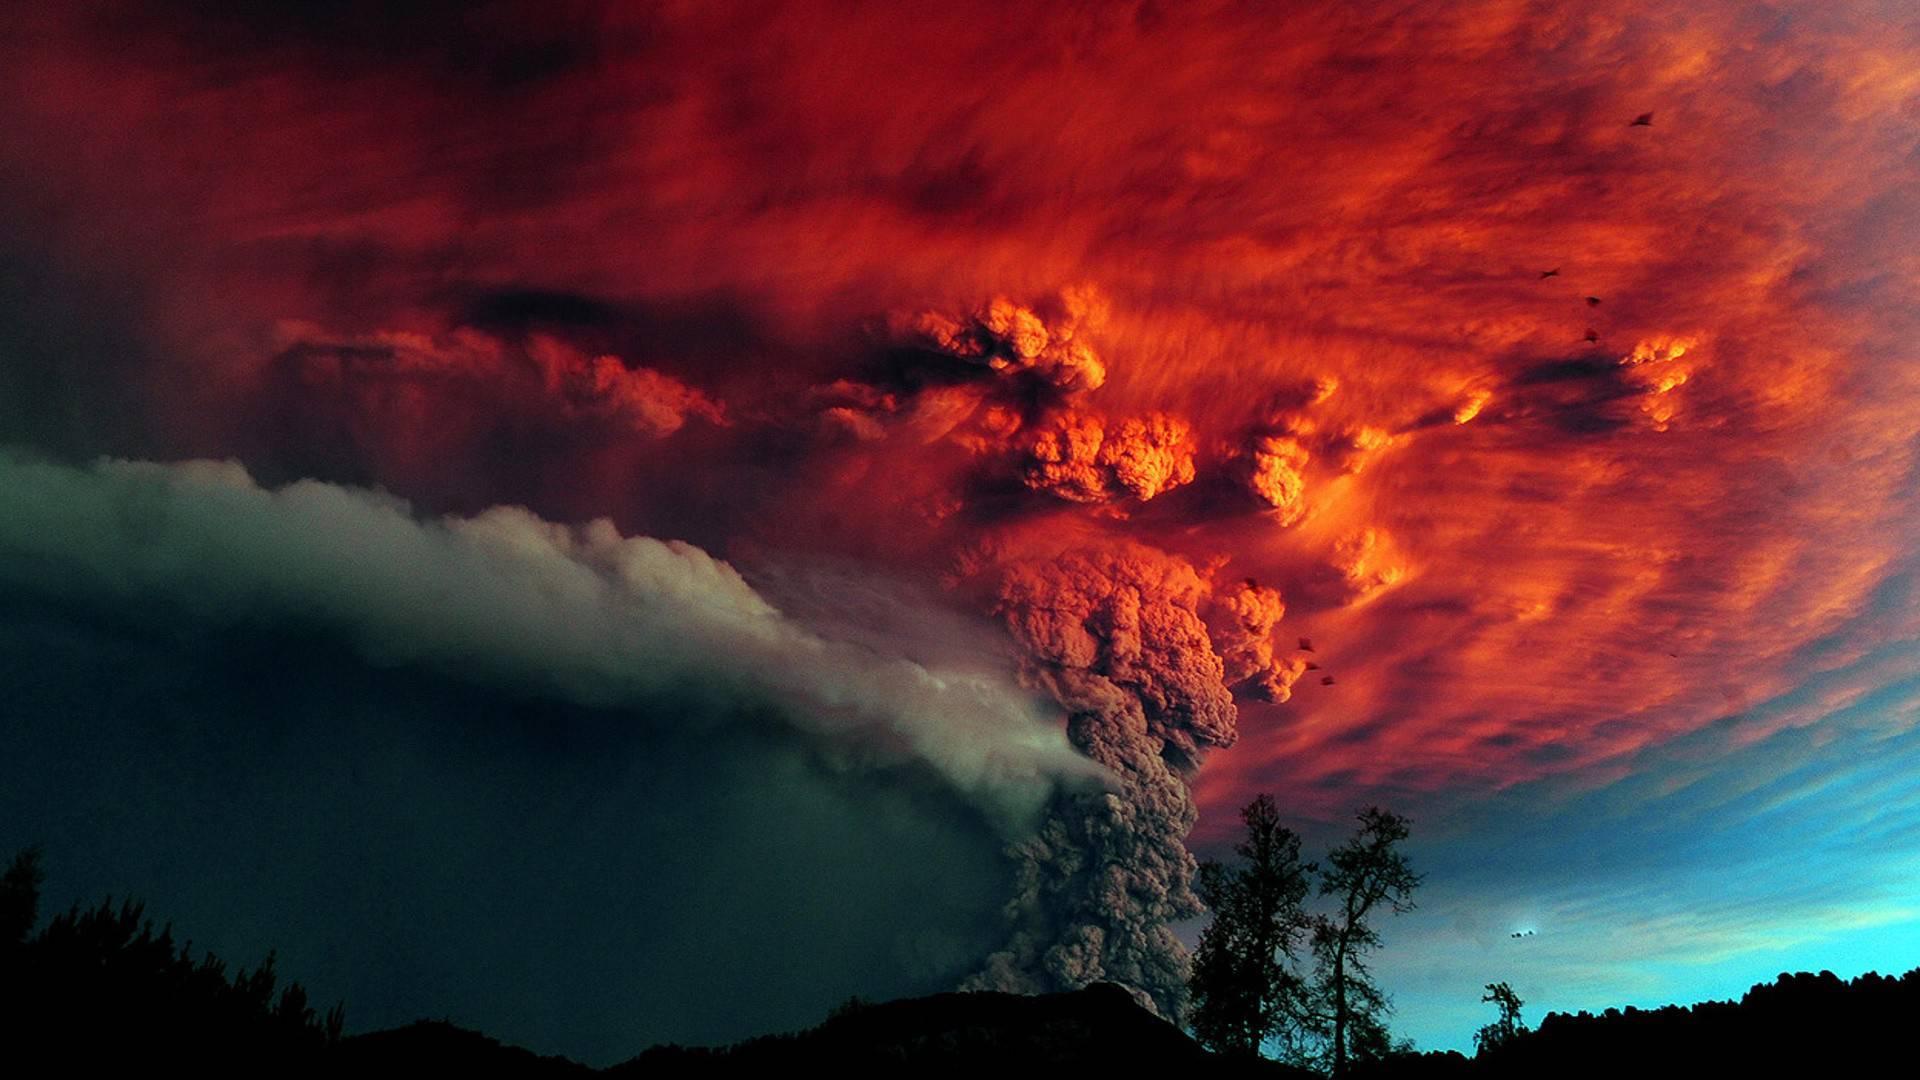 volcano background best image